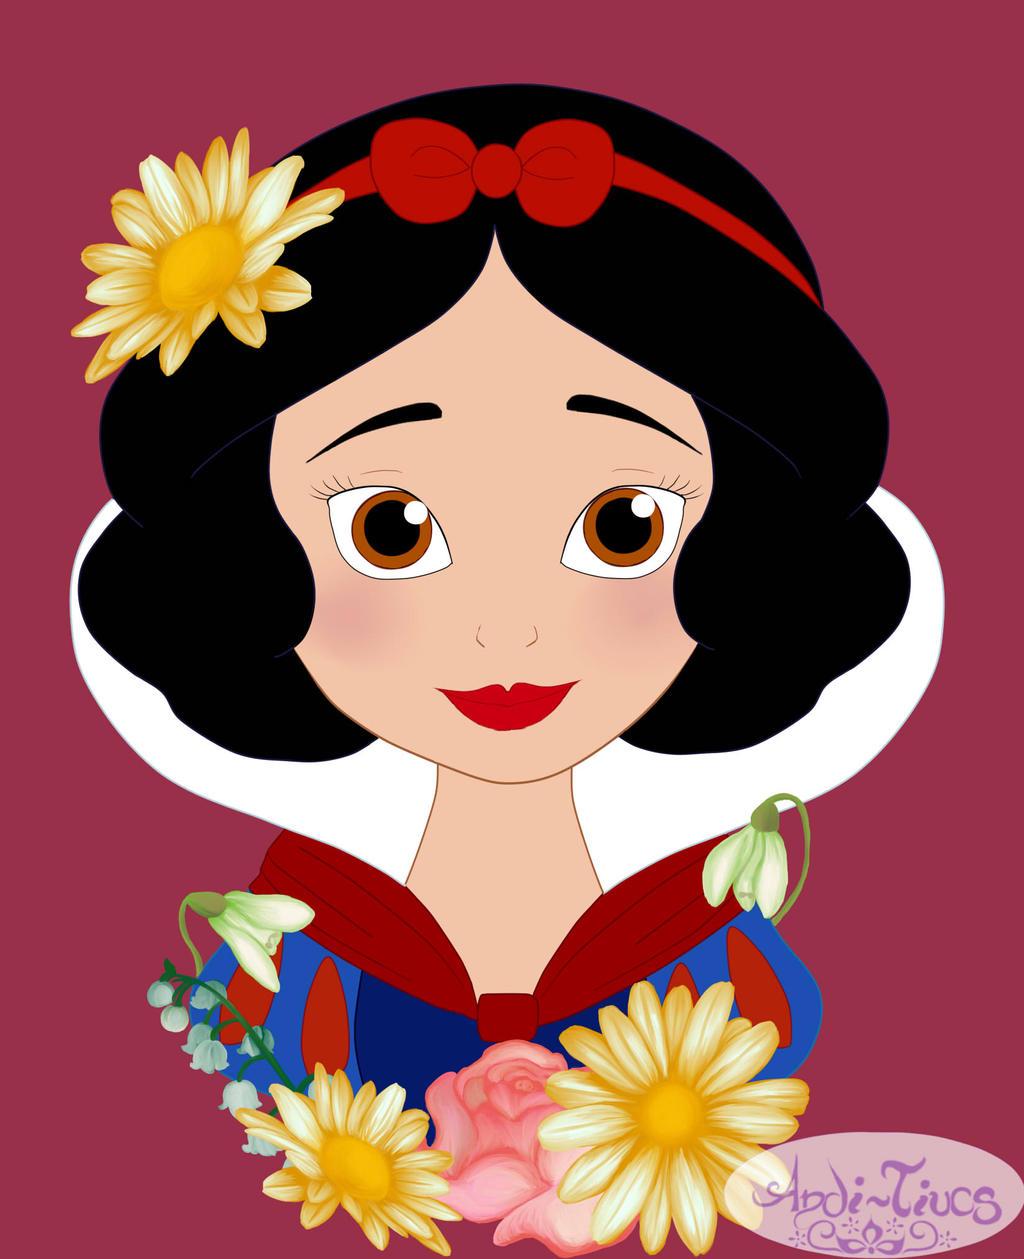 Flower Princess Snow White by Andi Tiucs on DeviantArt